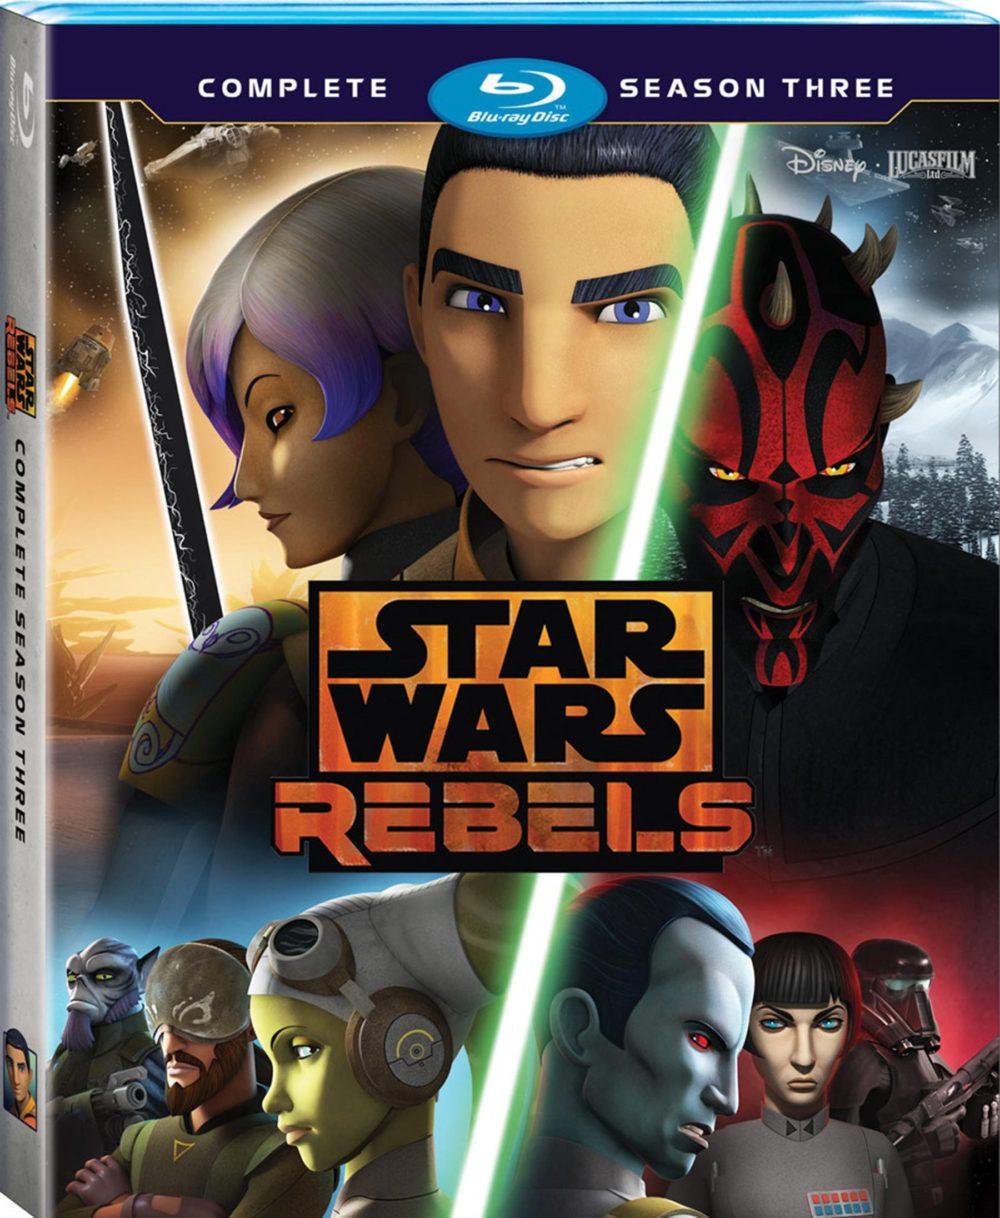 star wars rebels stagione 3 blu-ray home video copertina